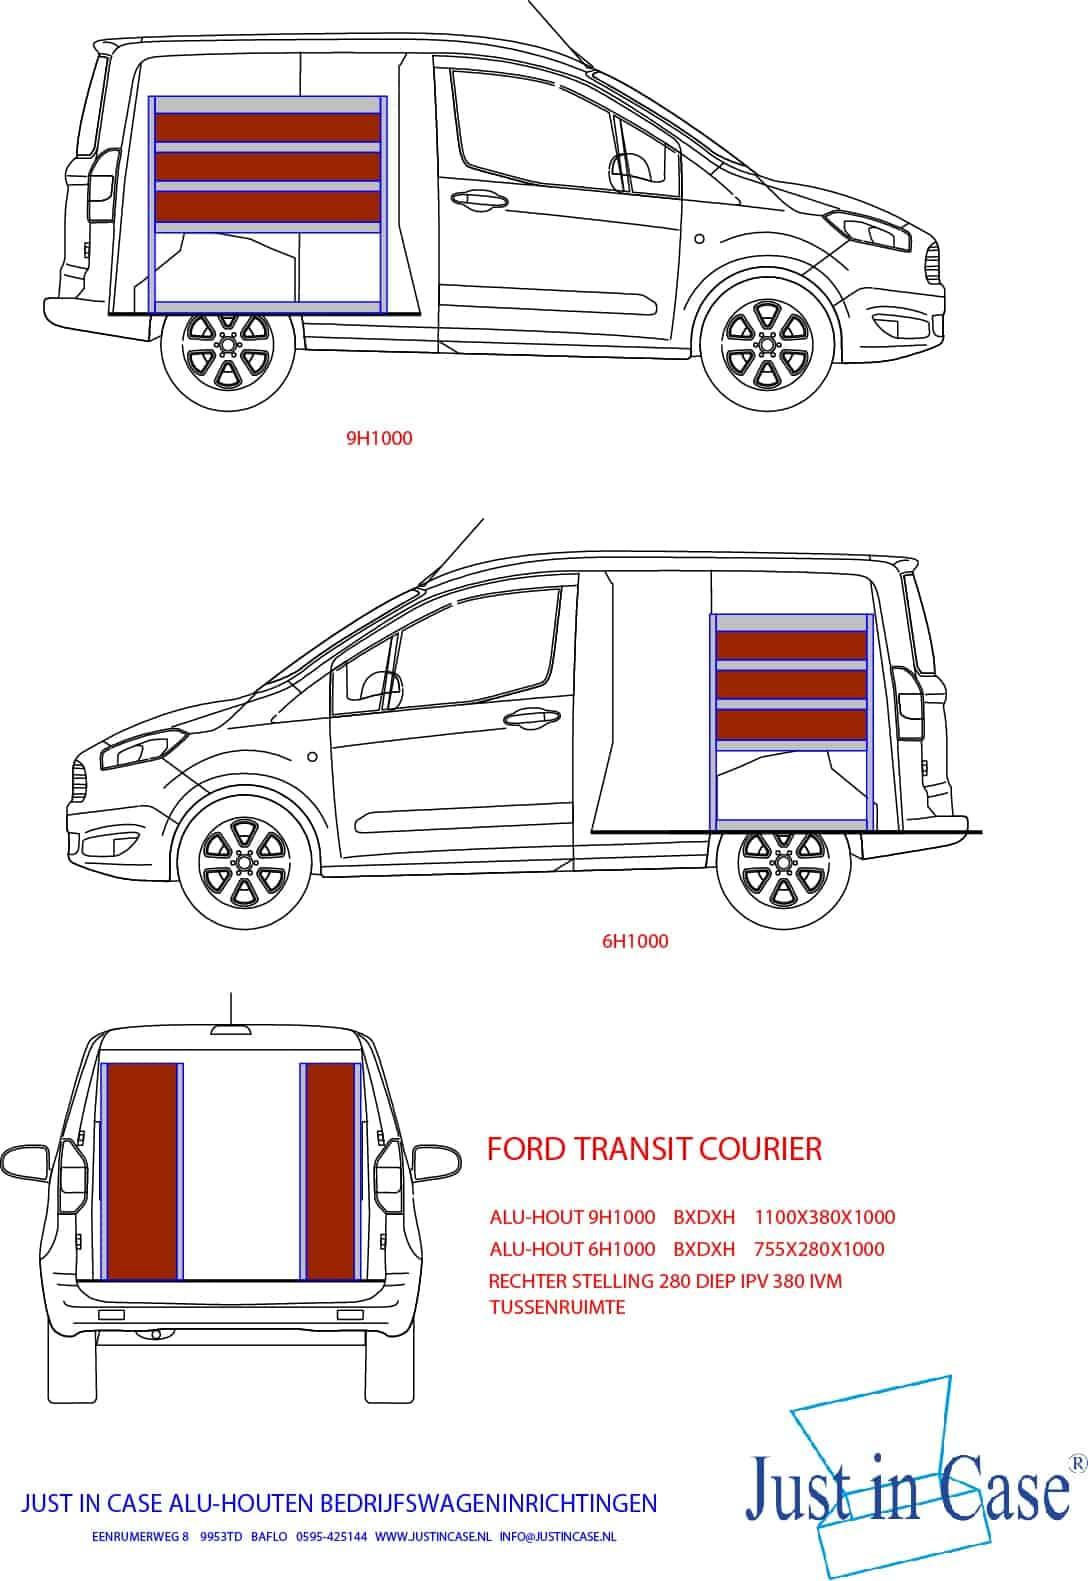 Ford Transit Courier bedrijfswageninrichting